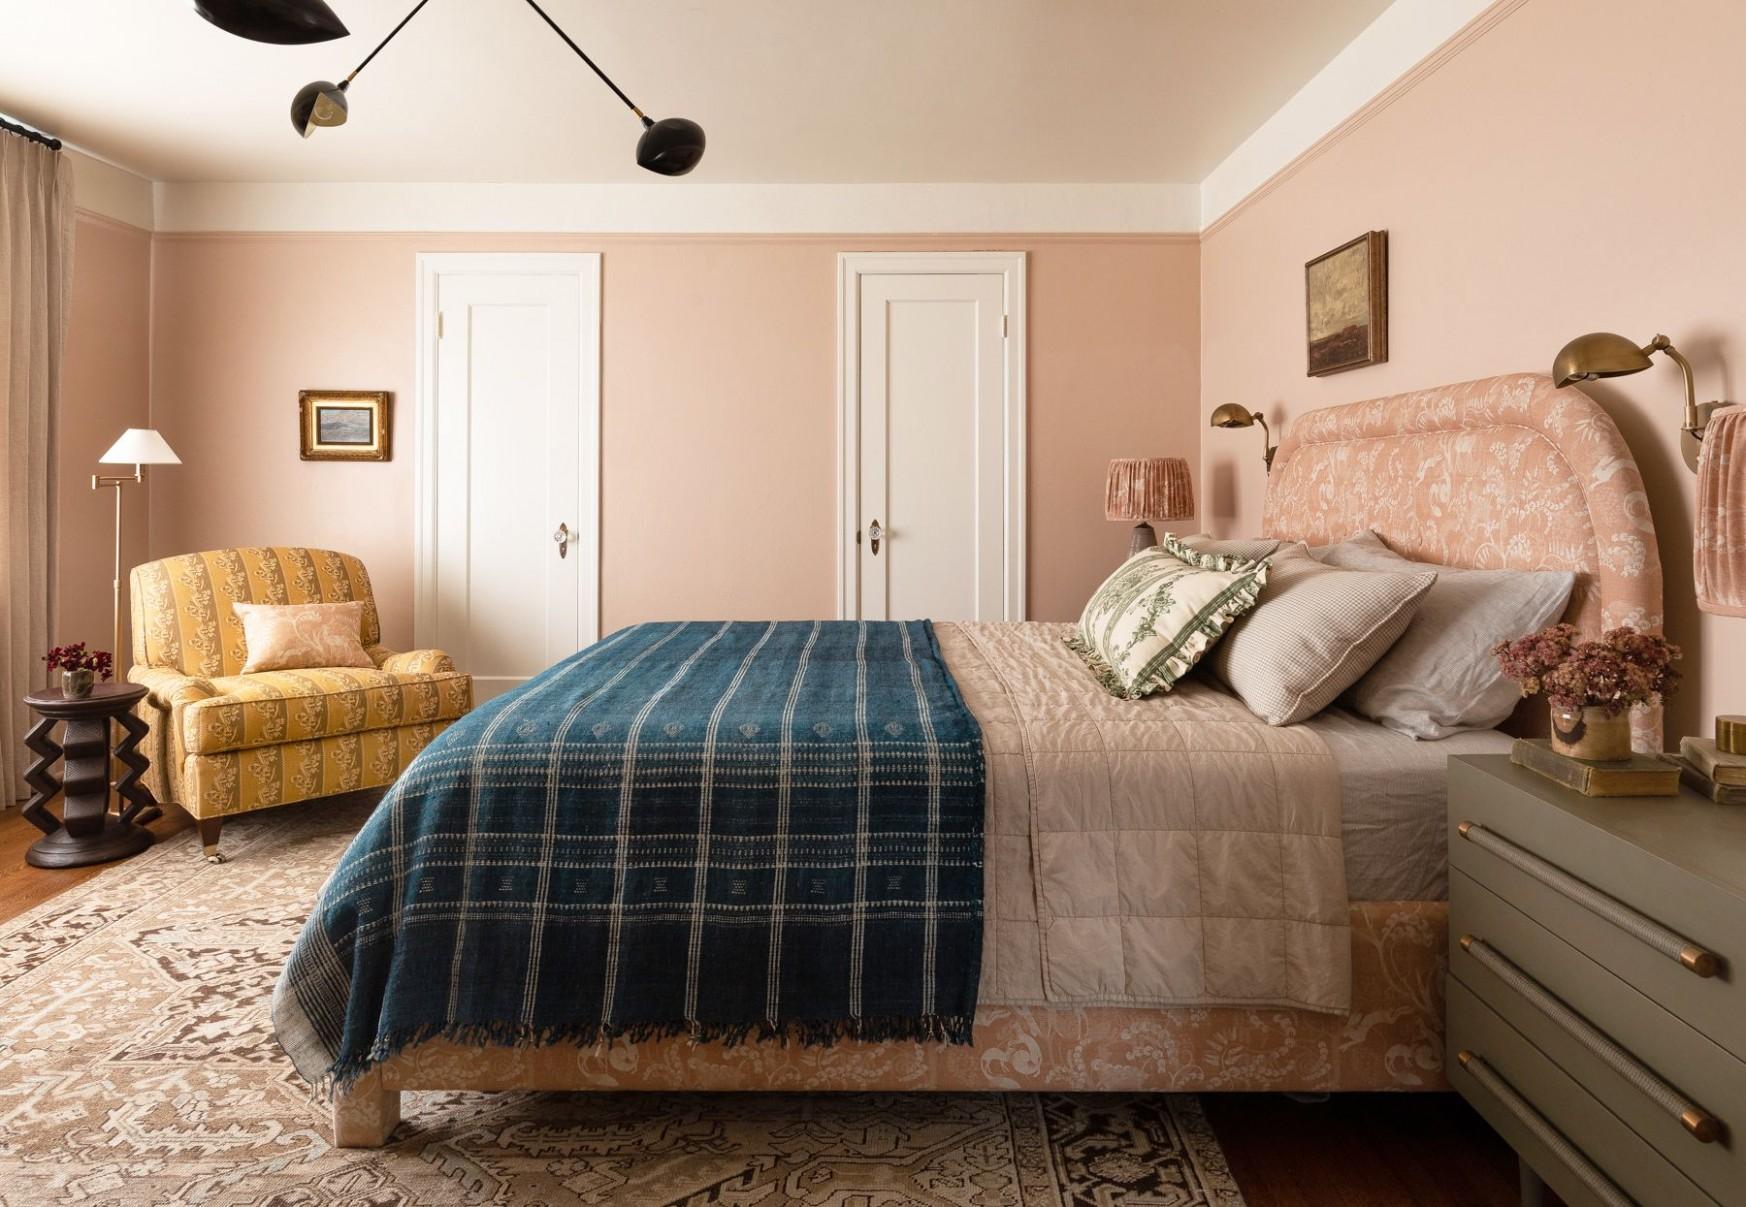 8 Best Bedroom Colors 8 - Paint Color Ideas for Bedrooms - Bedroom Ideas Colours